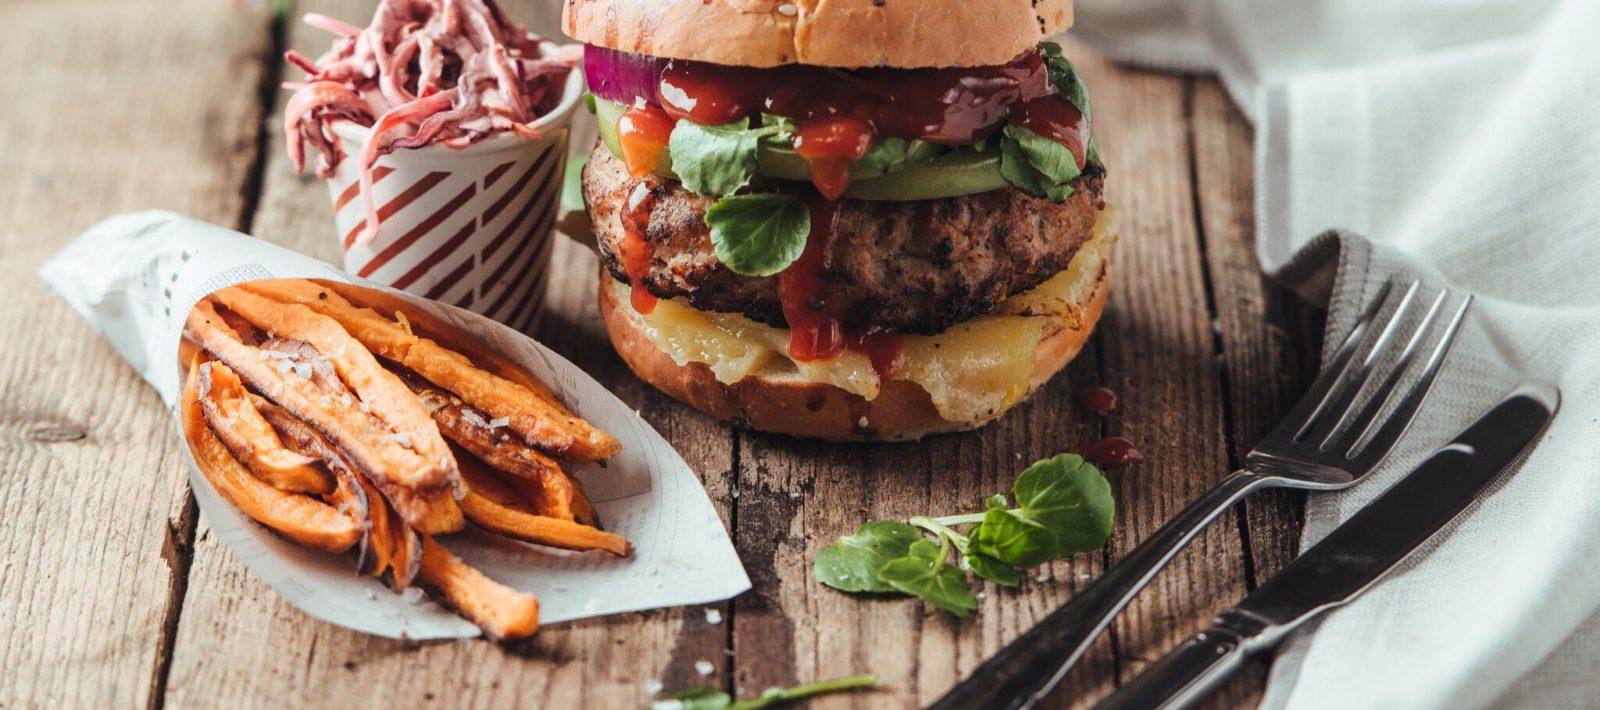 Lincolnshire Sausage Burger by Steven Bennett